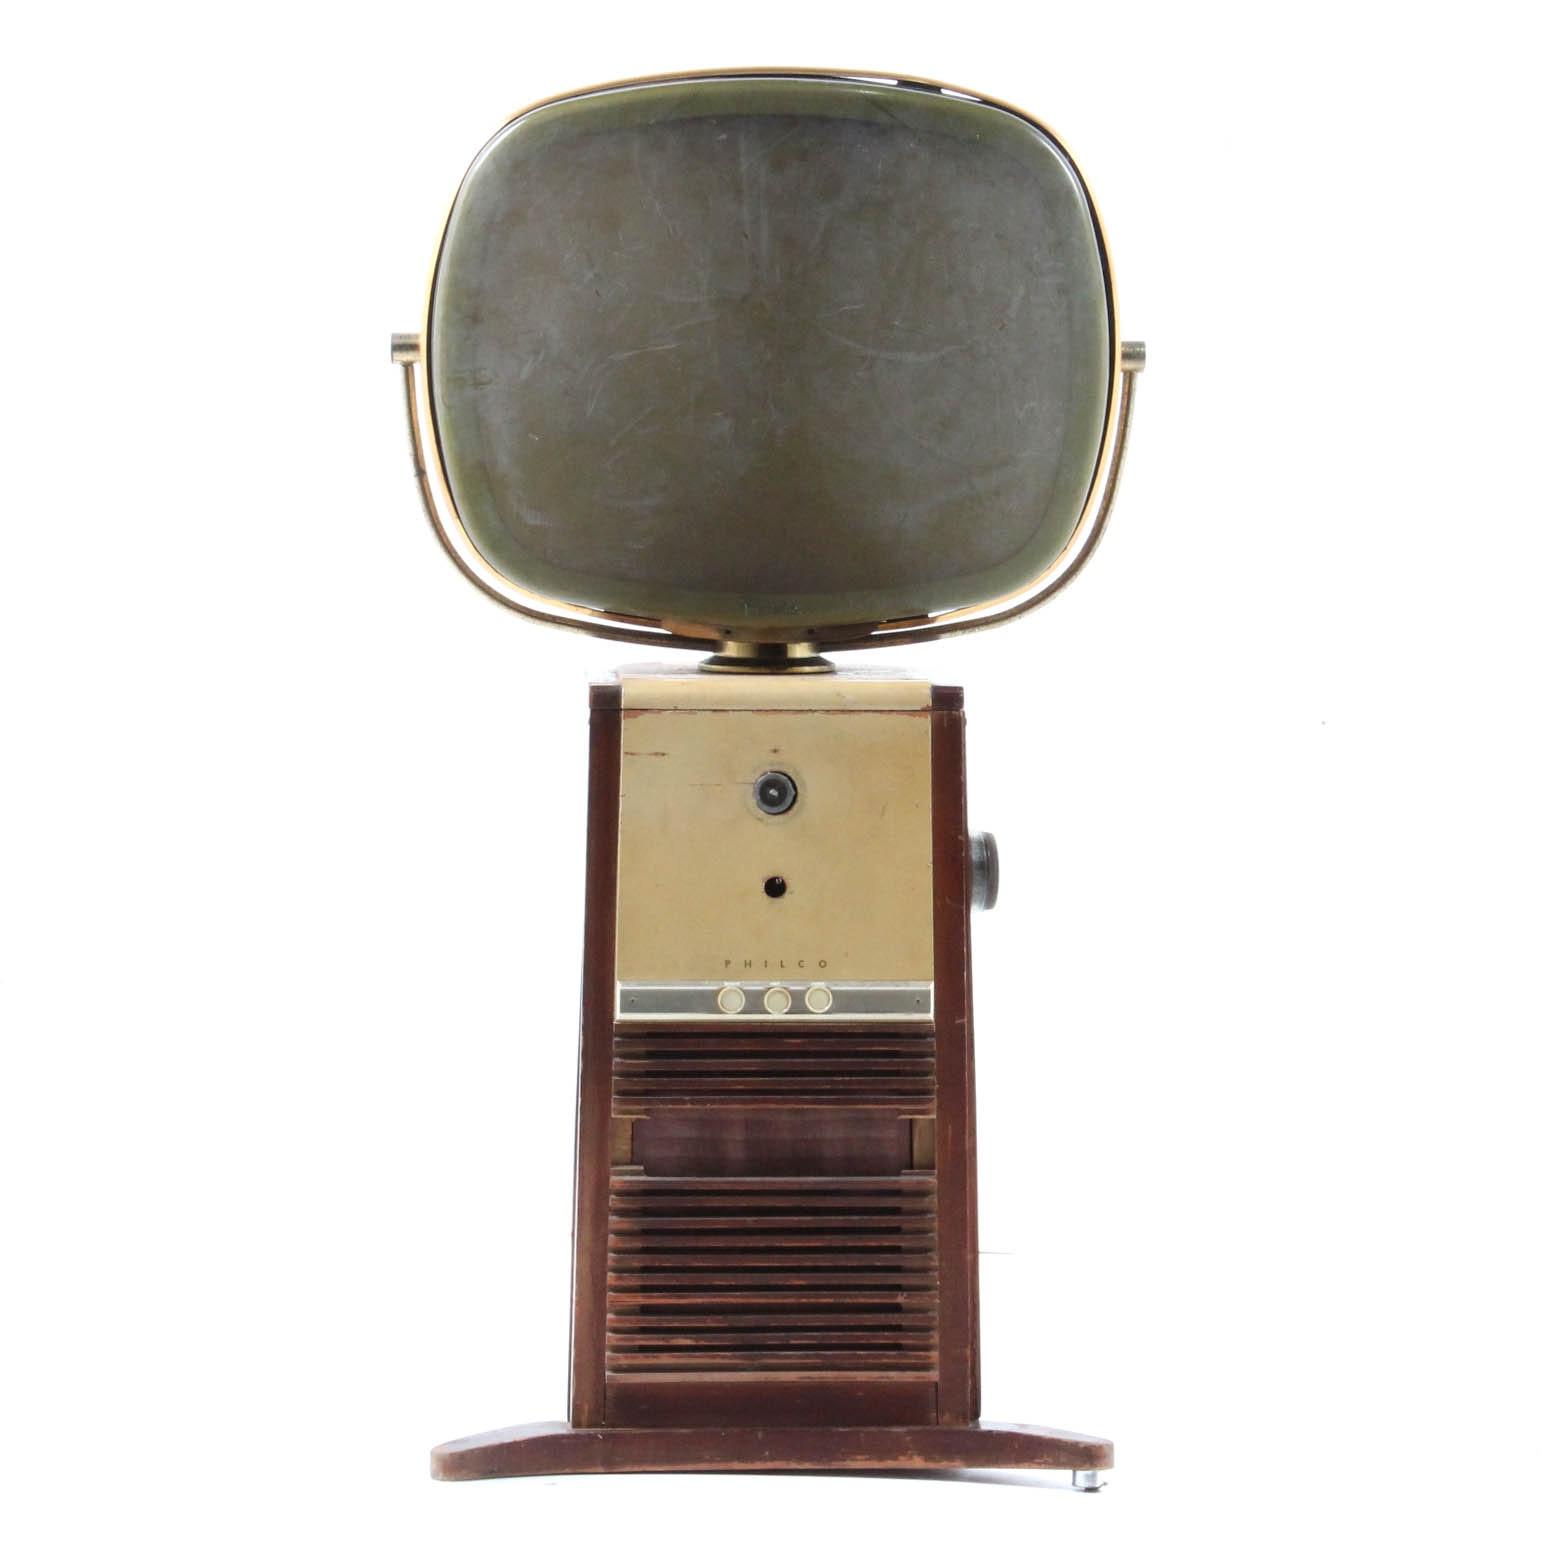 Vintage Philco Predicta Telvision with Stand